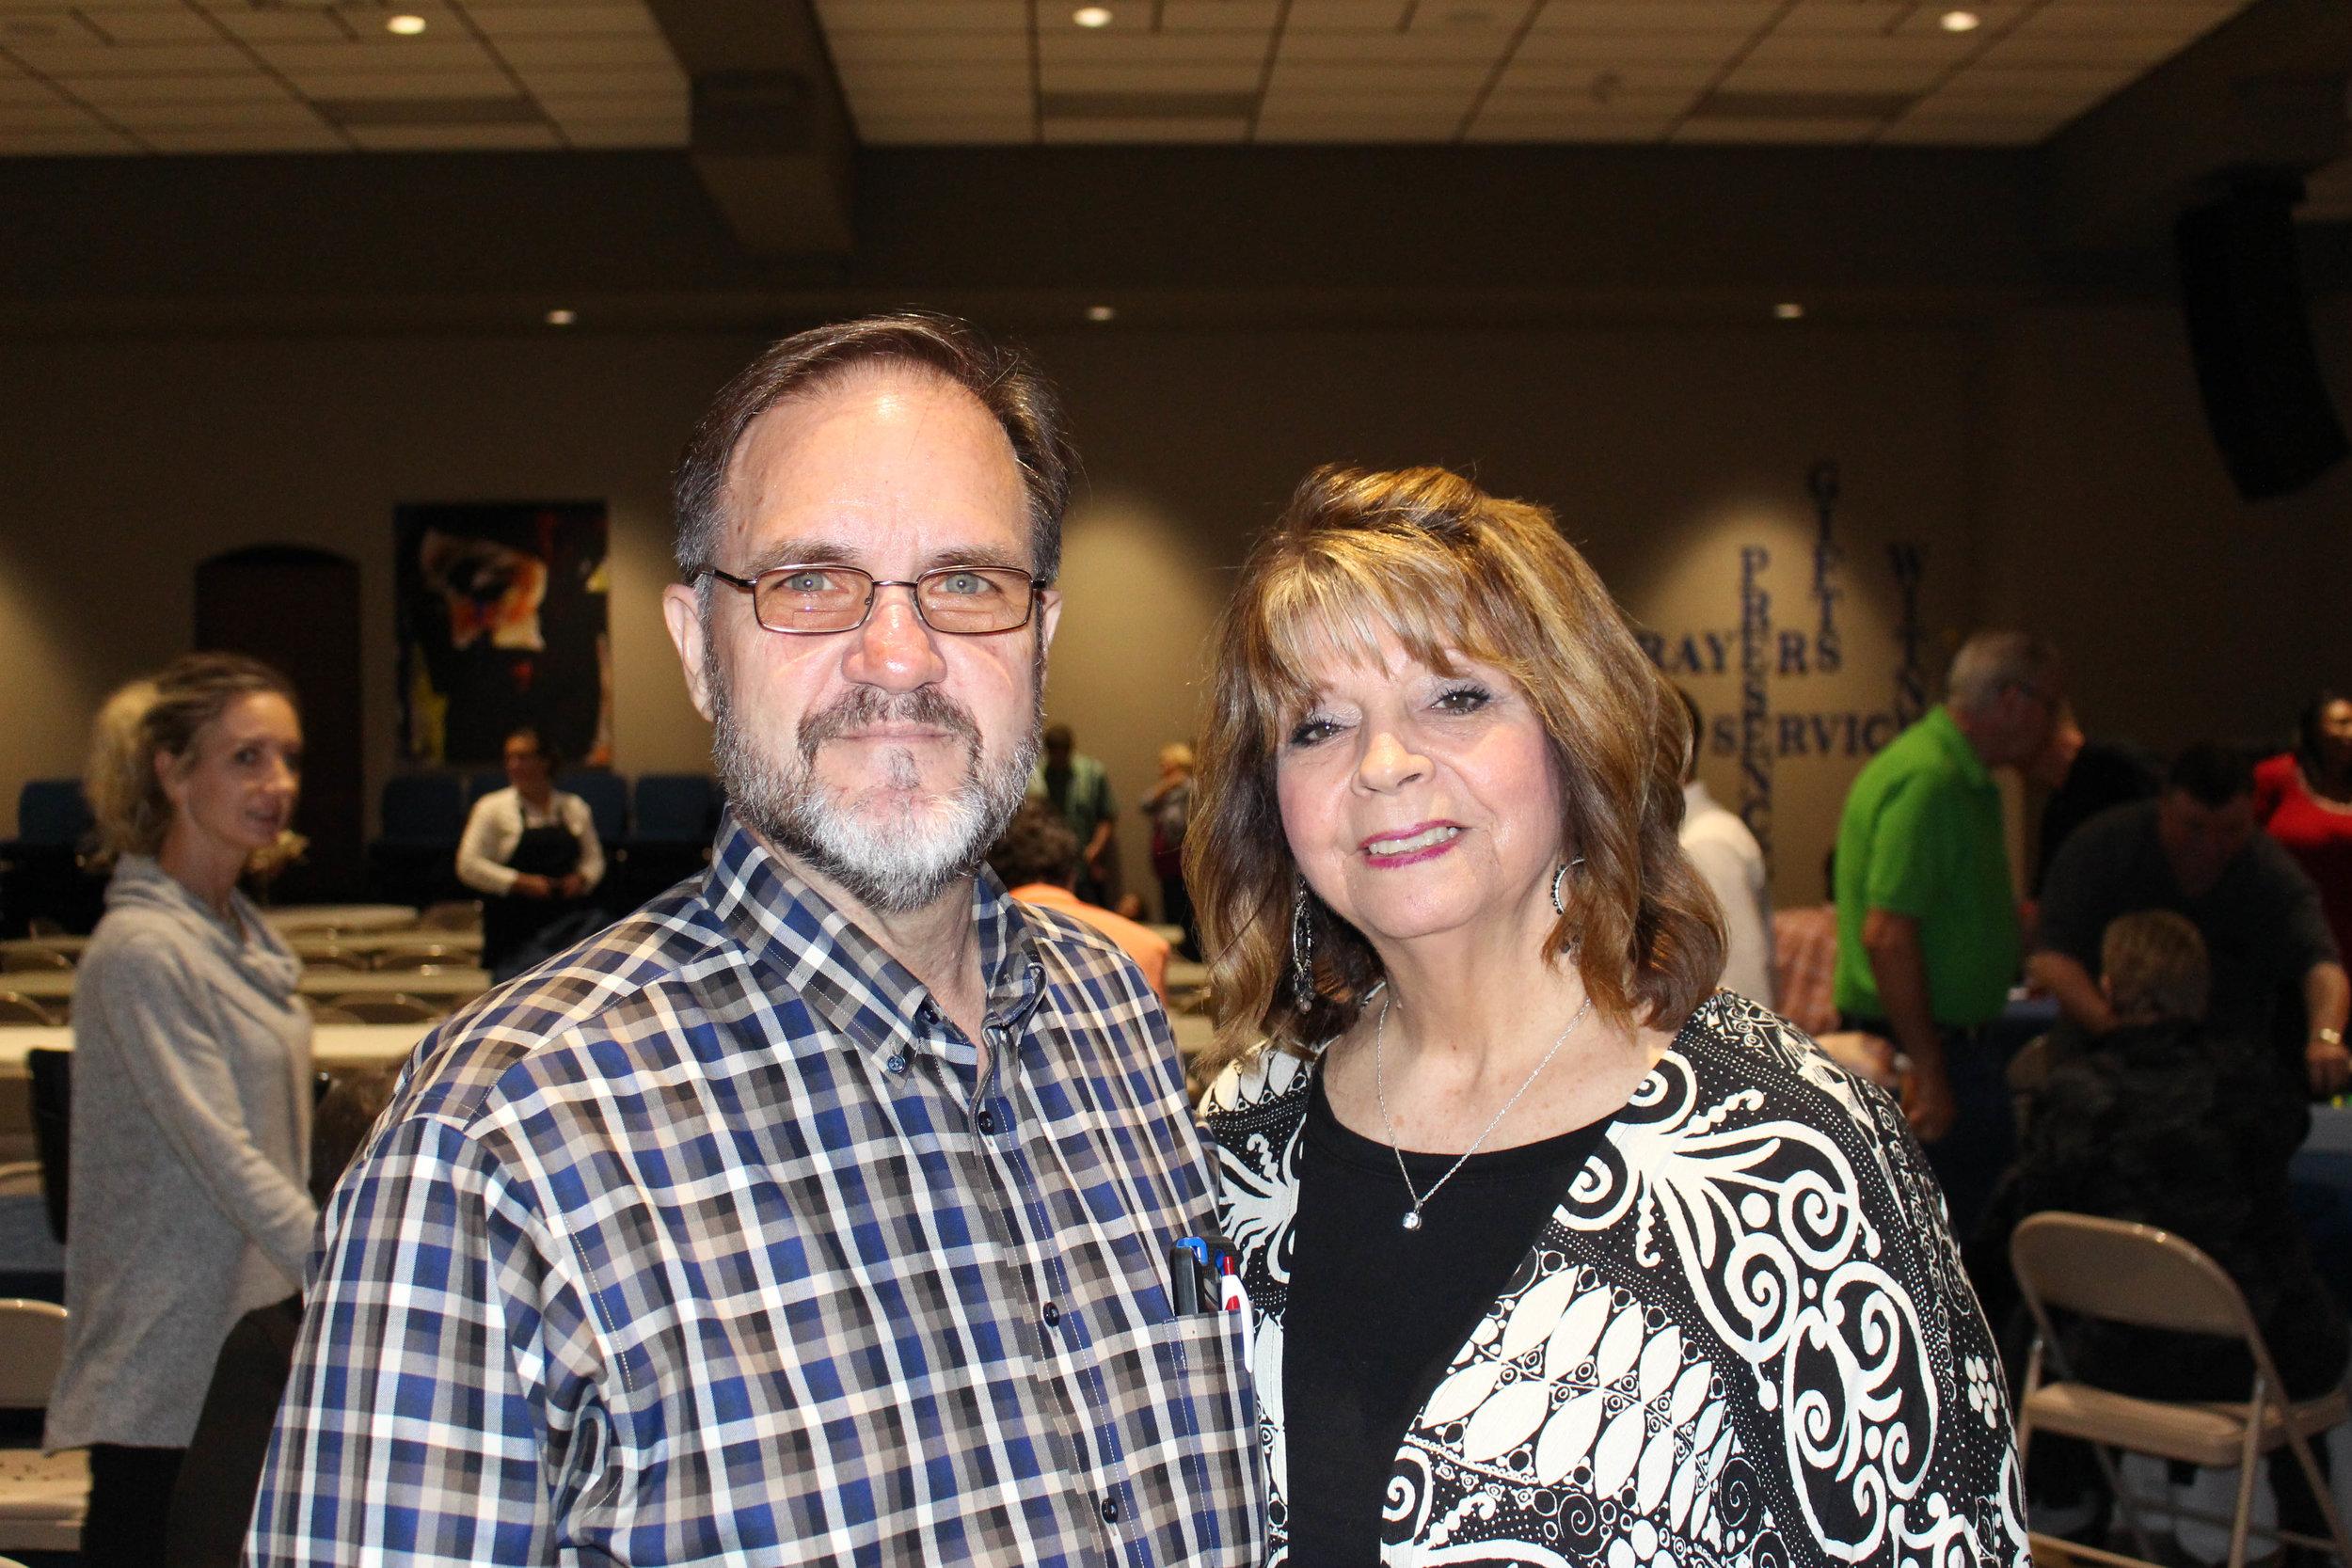 Robert and Jayne Cooper